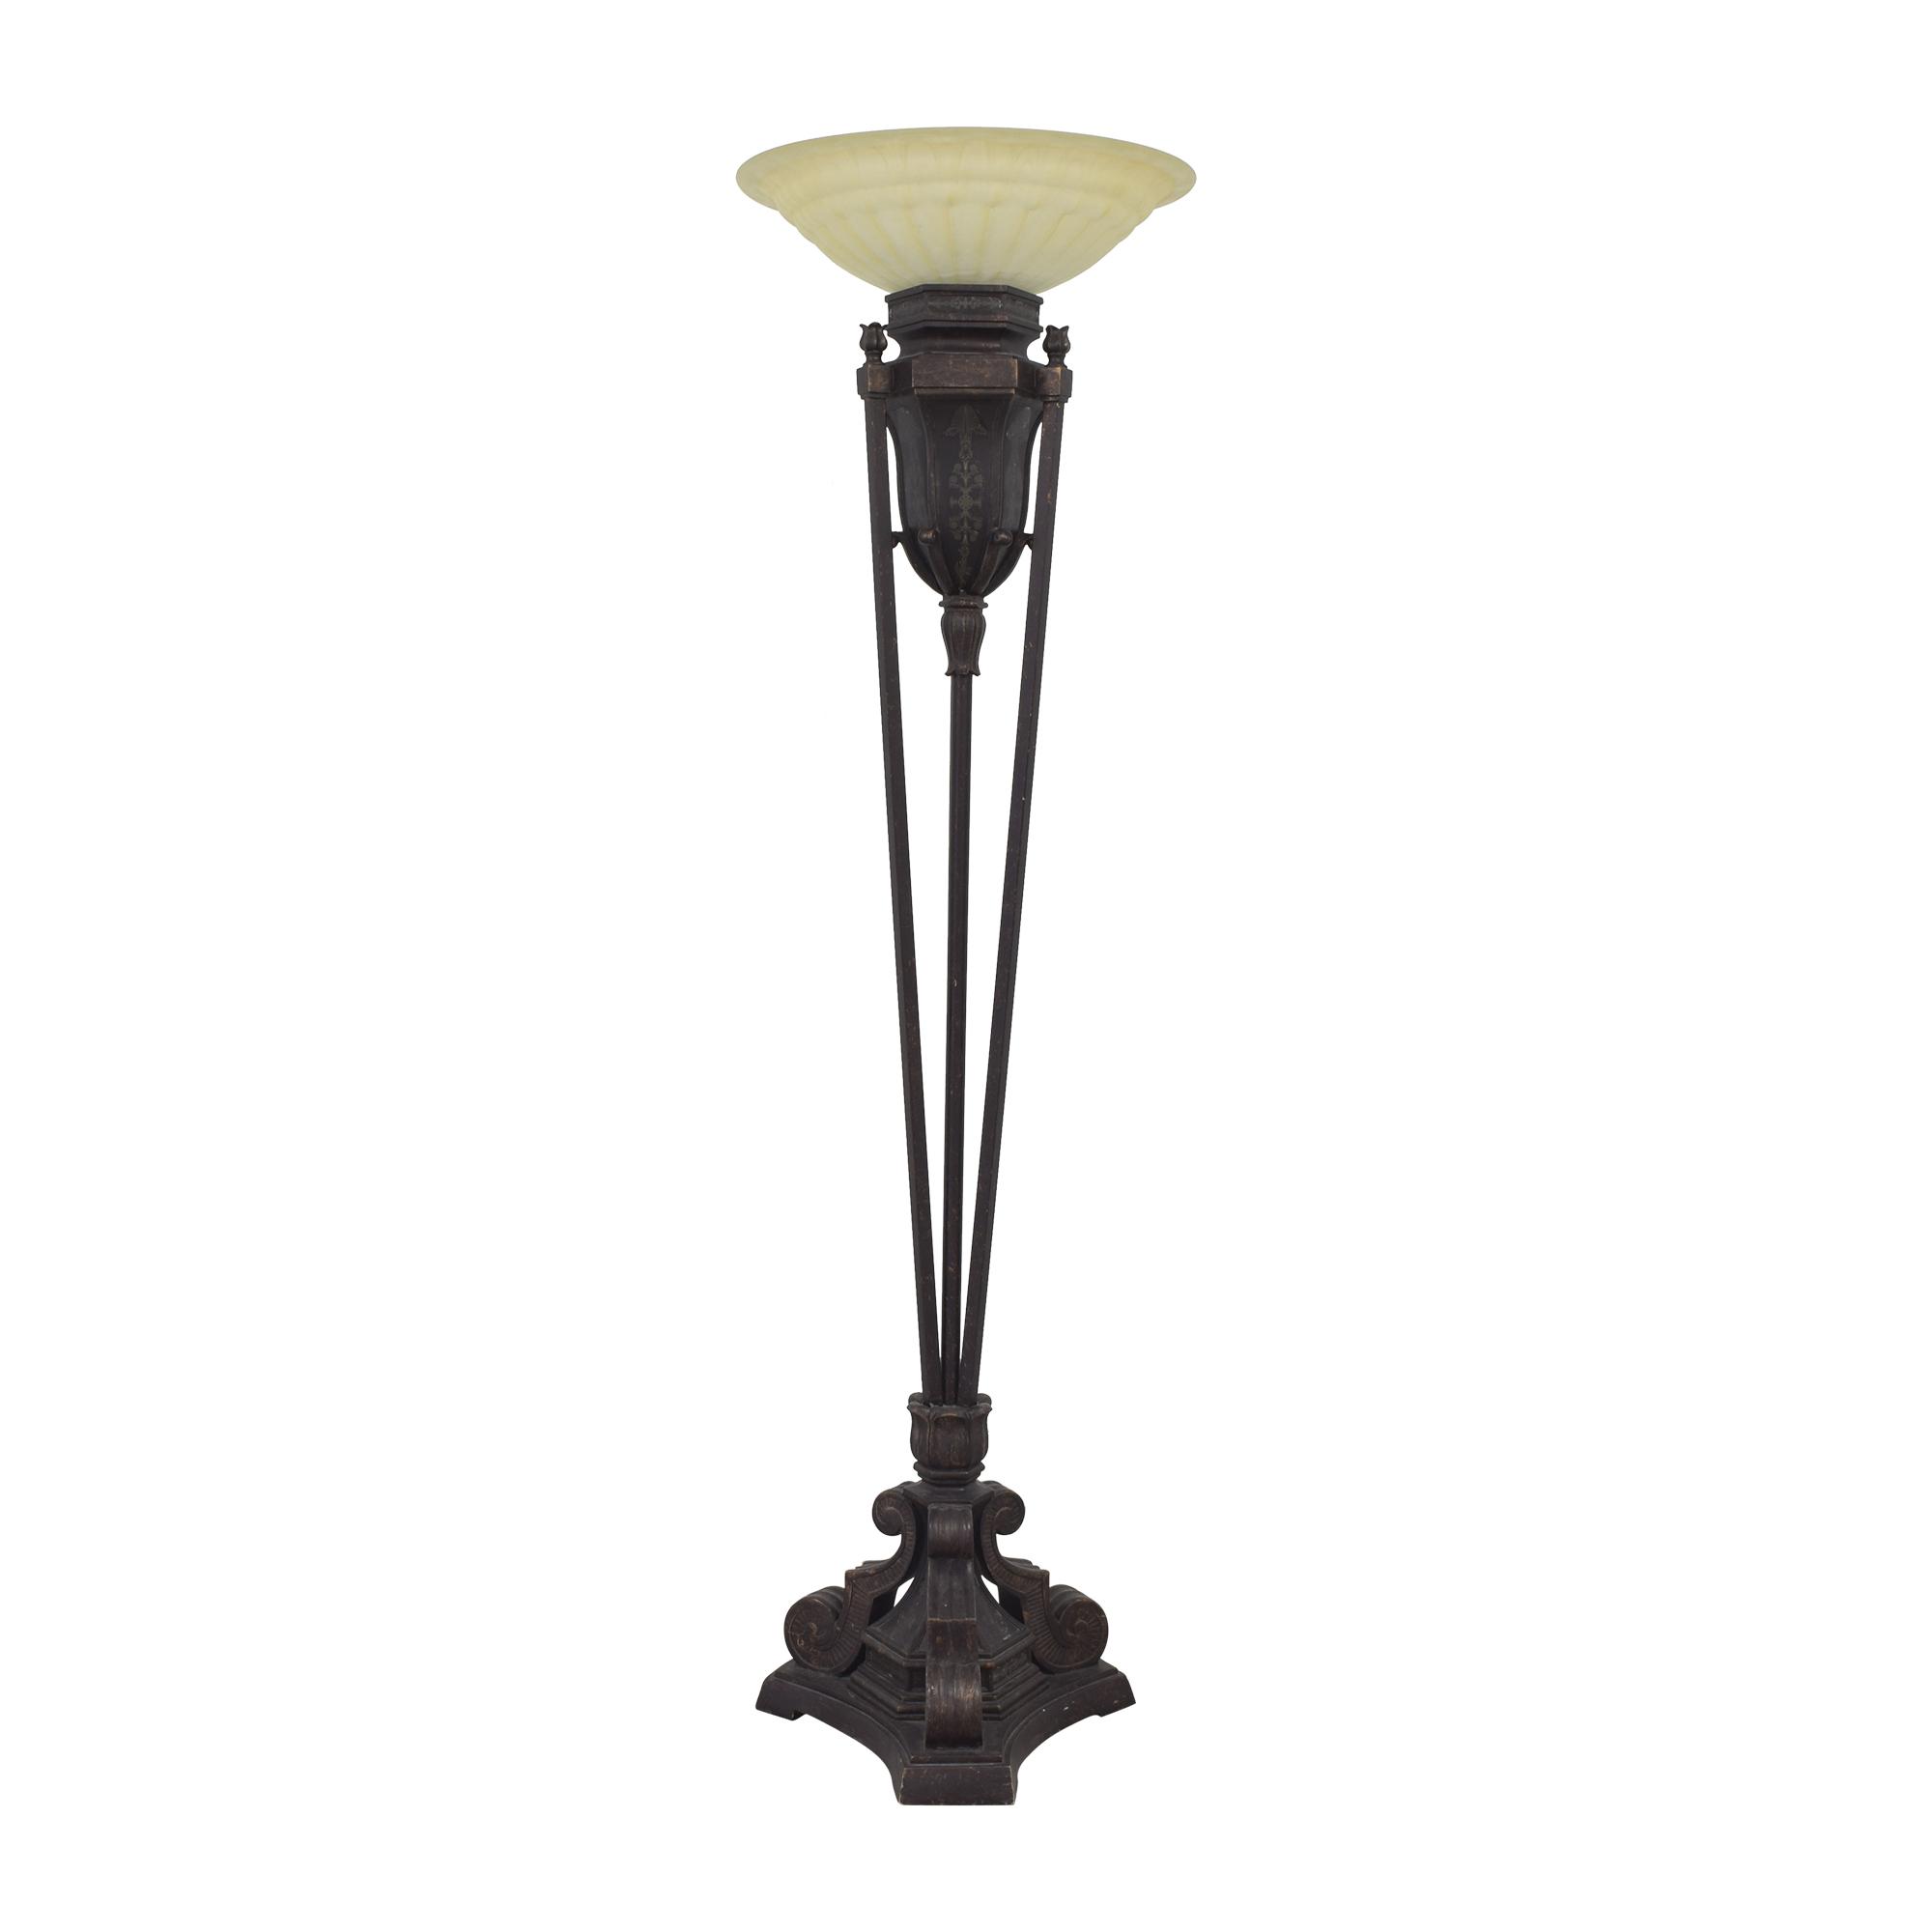 Pacific Coast Lighting Pacific Coast Lighting Torchiere Floor Lamp for sale